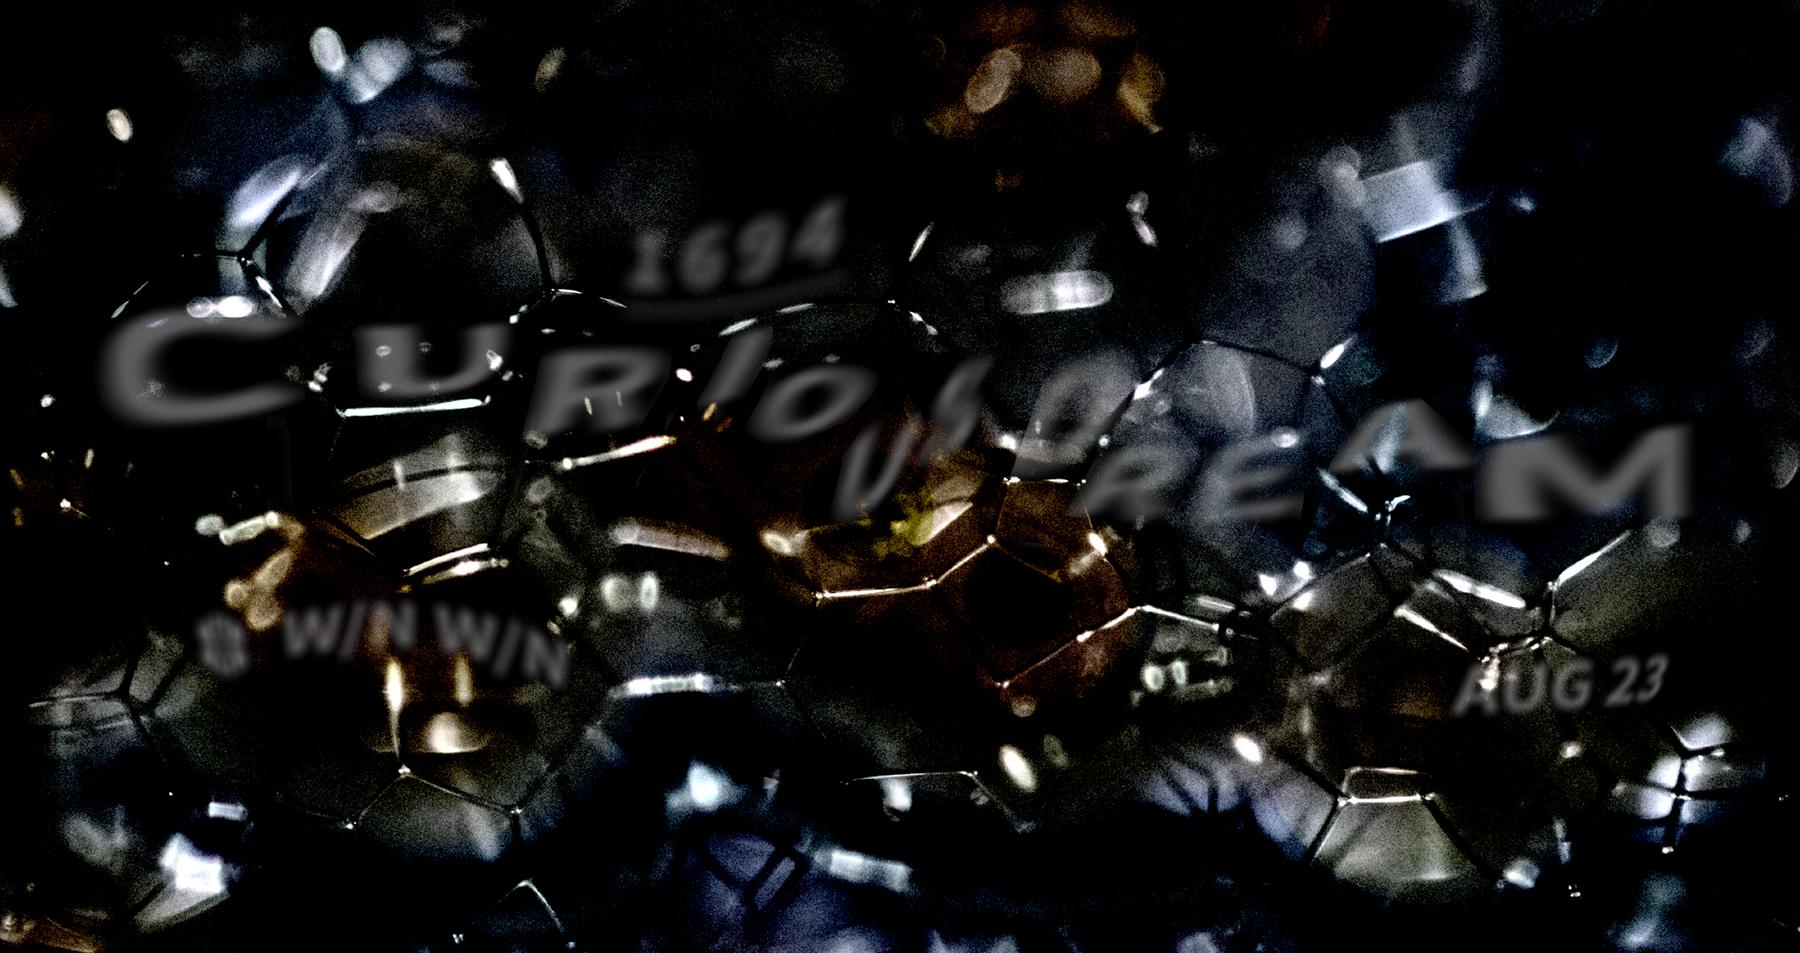 CuriousDream_AUG23_Banner.jpg